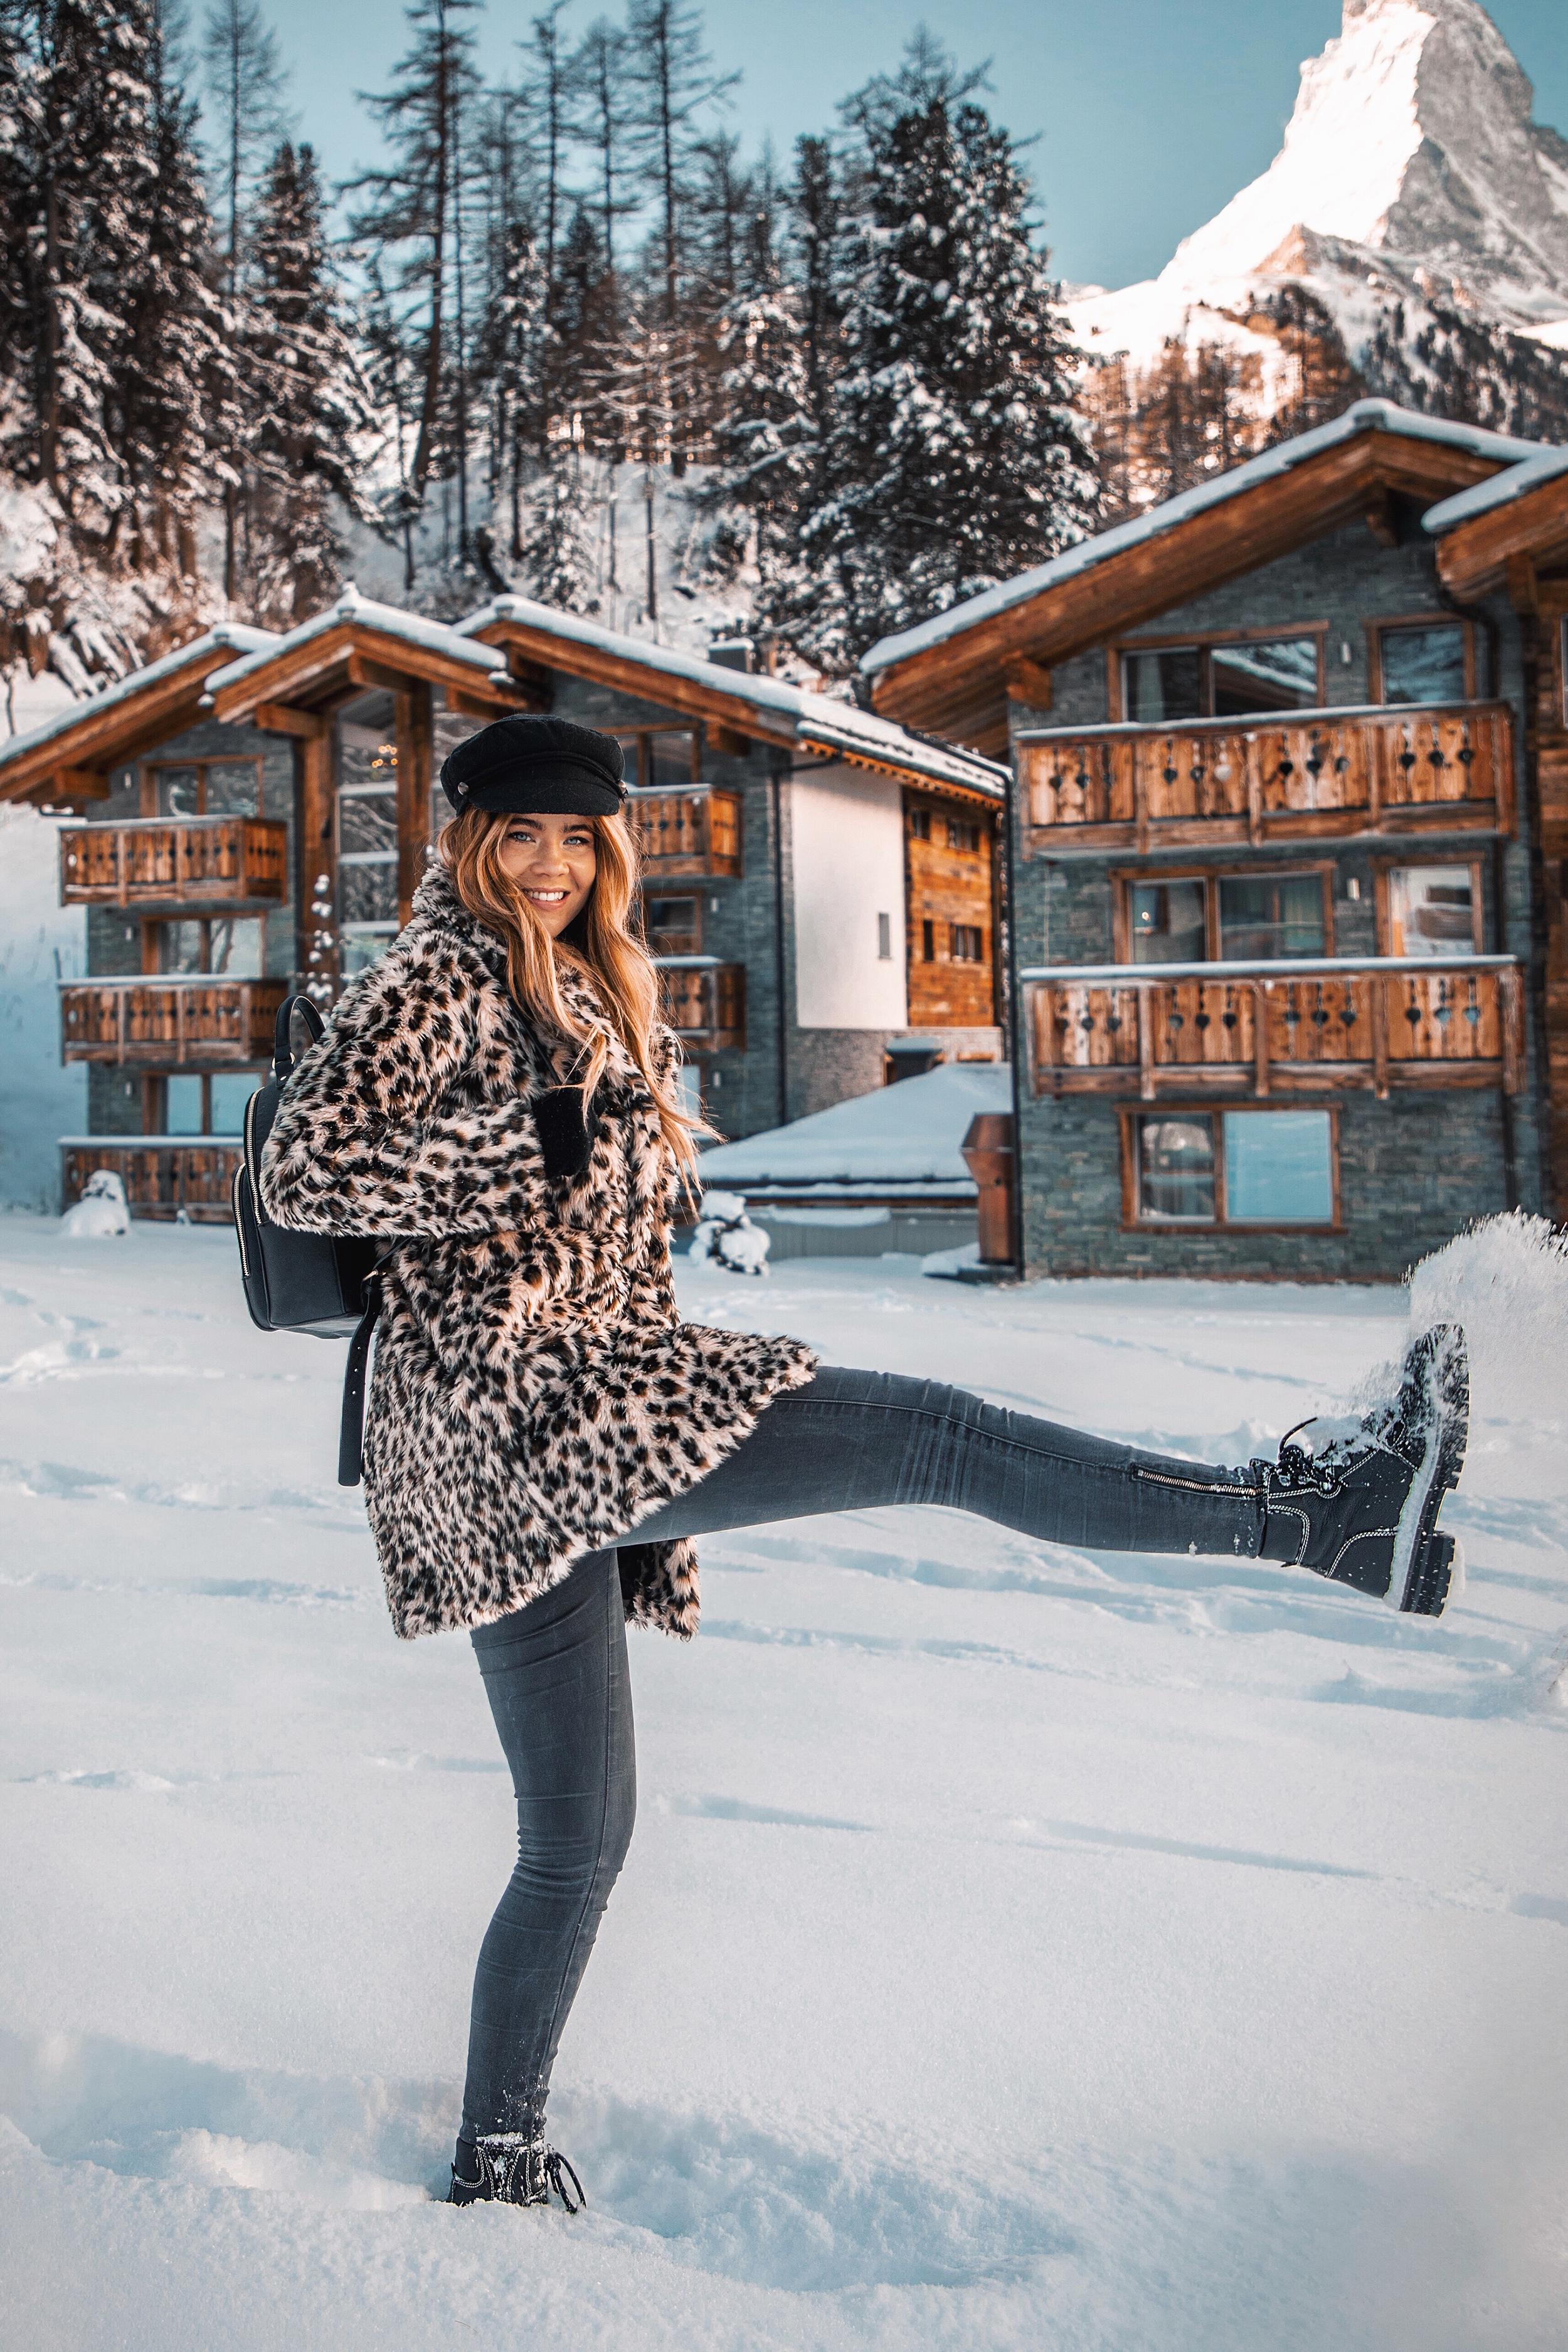 new-years-resolutions-goals-zermatt-switzerland_1.jpg